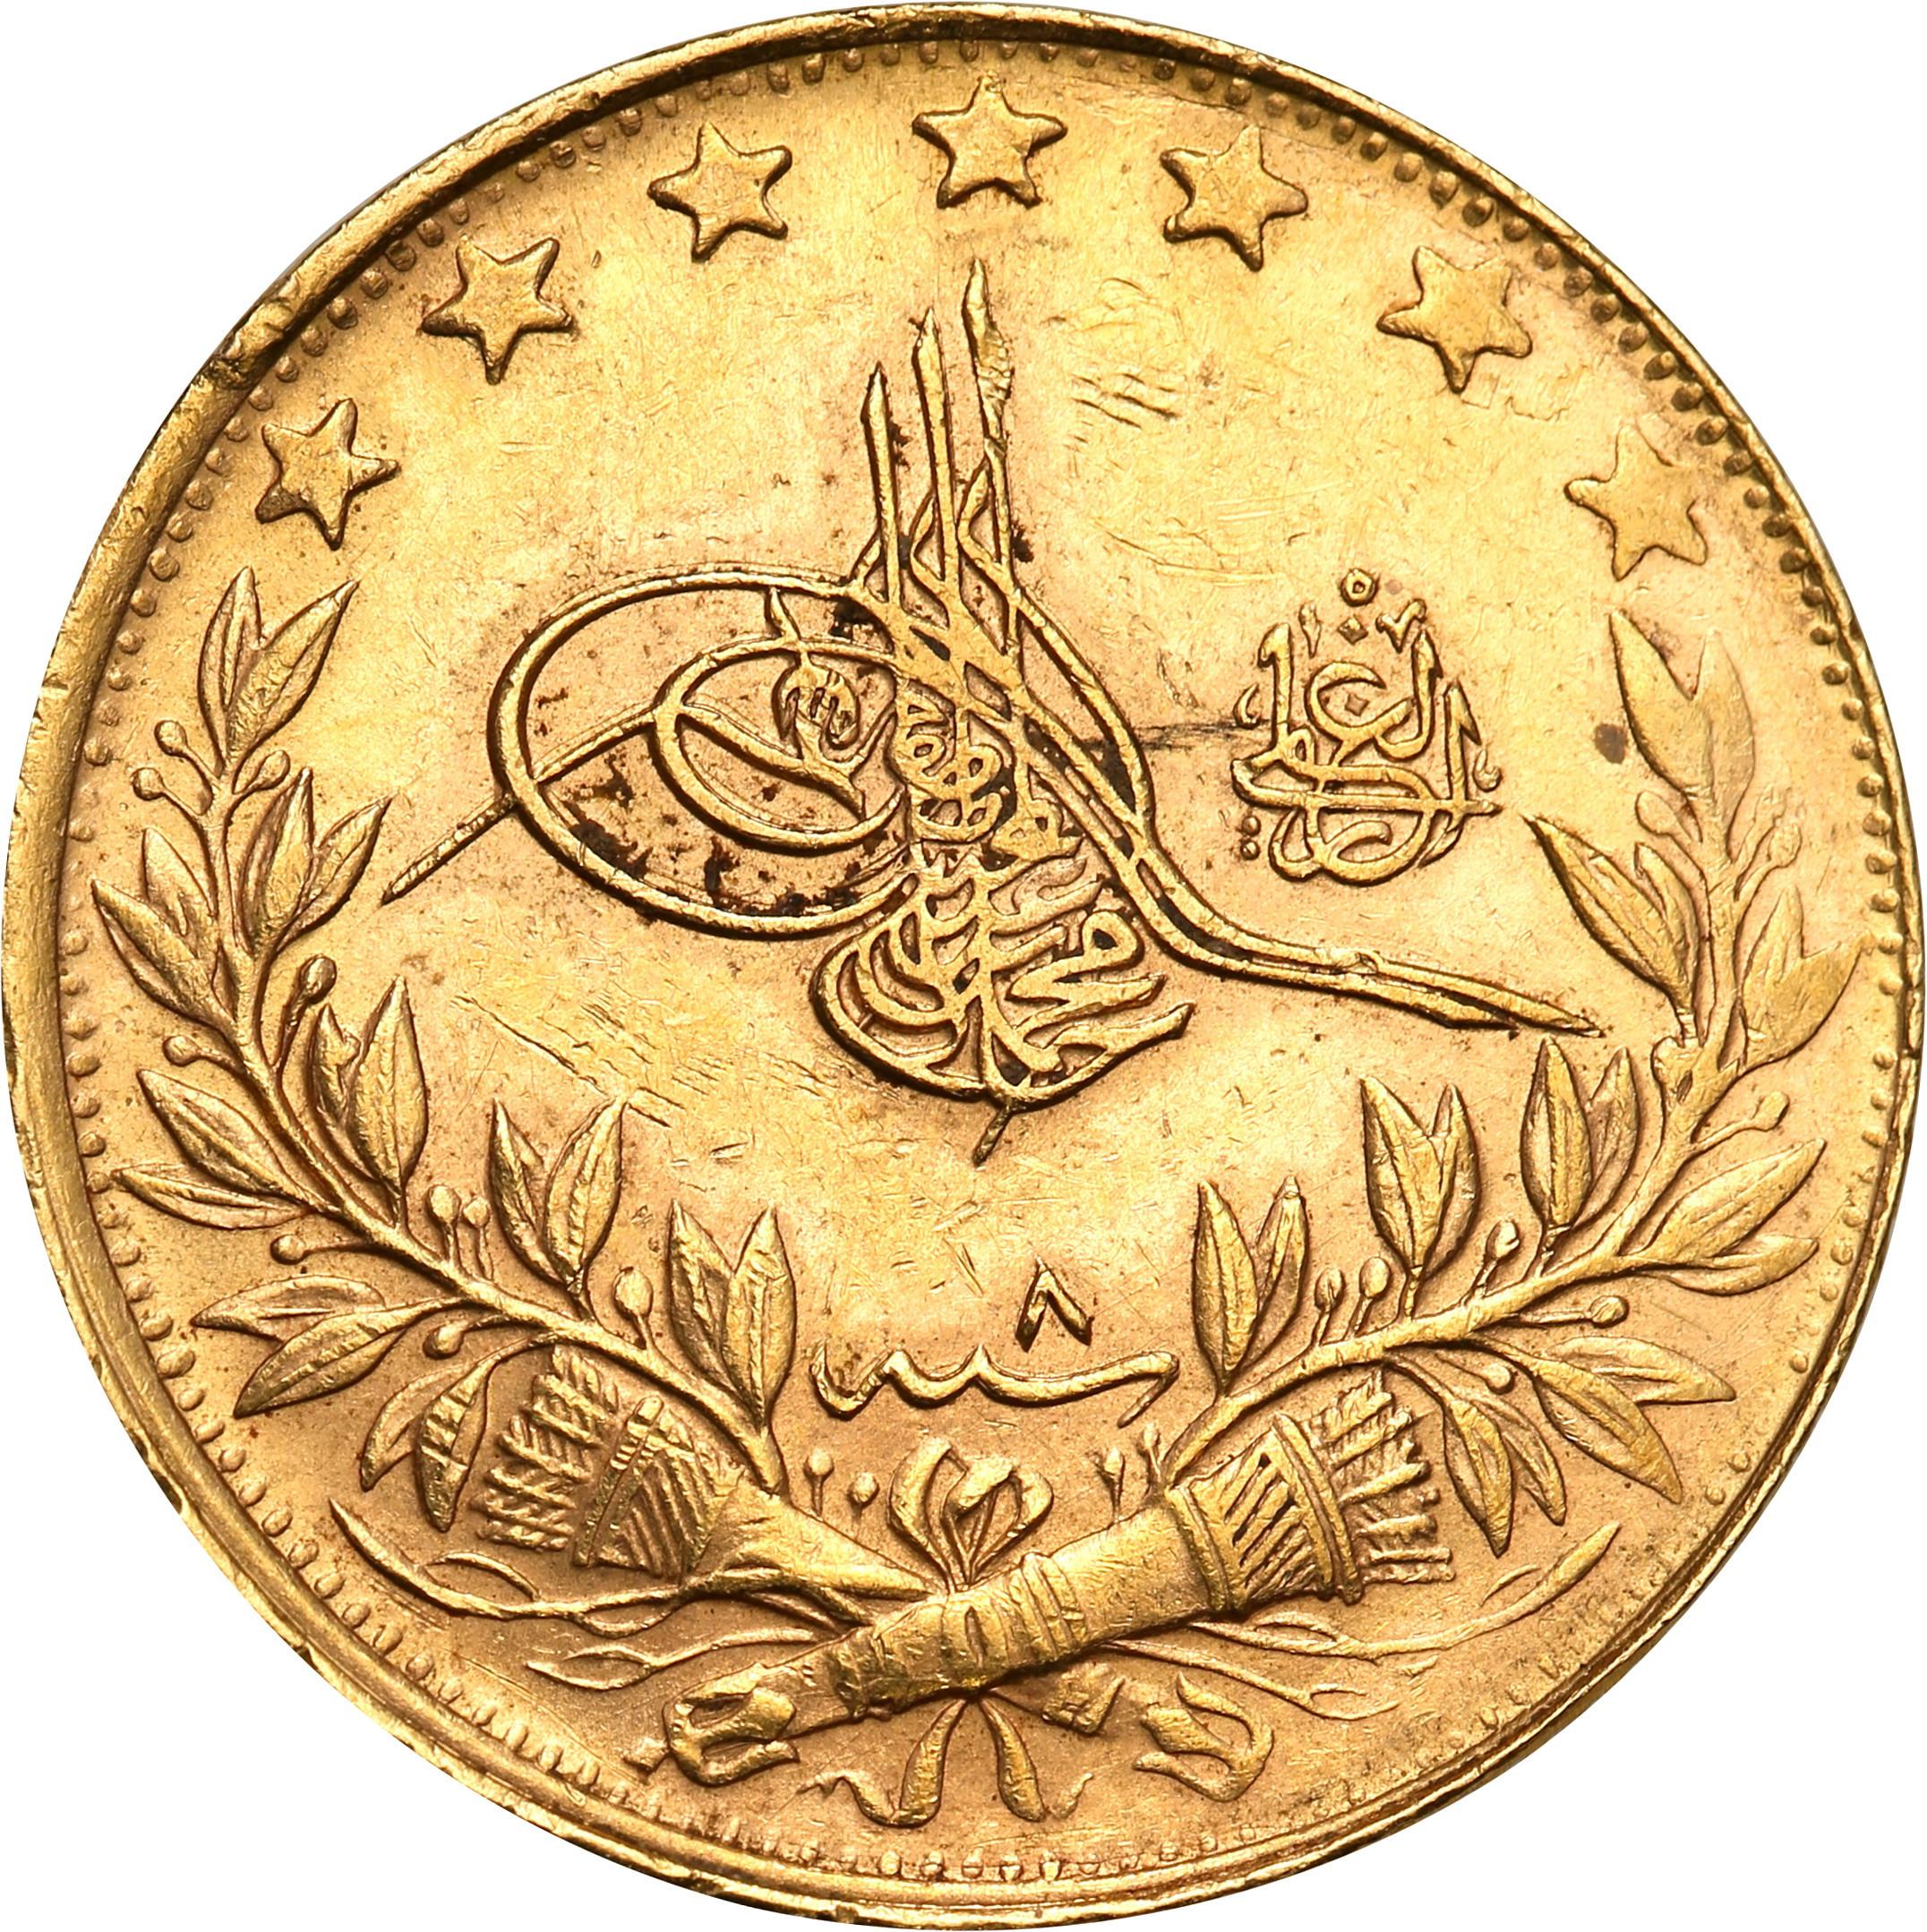 Turcja. 100 kurush 1327(7) AH = 1915 AD St.1